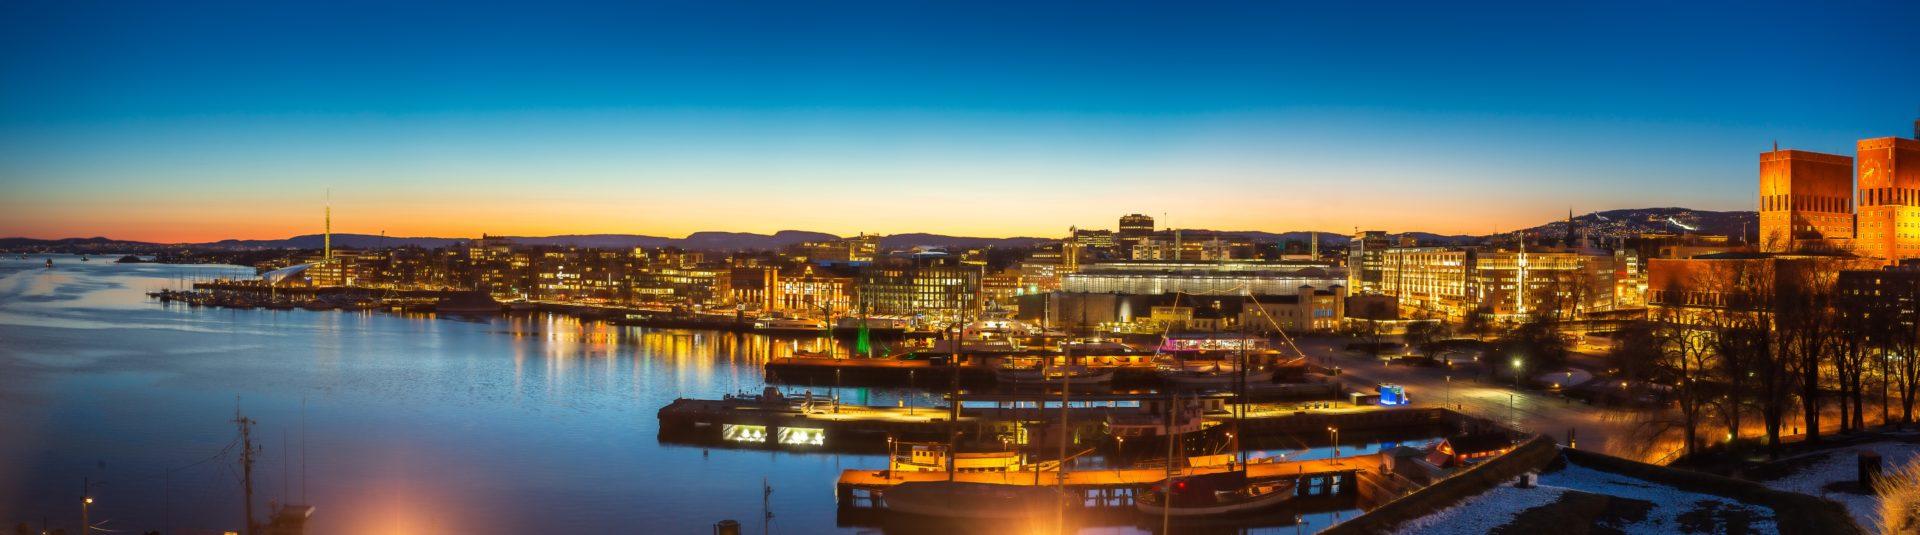 Photo of Oslo harbour